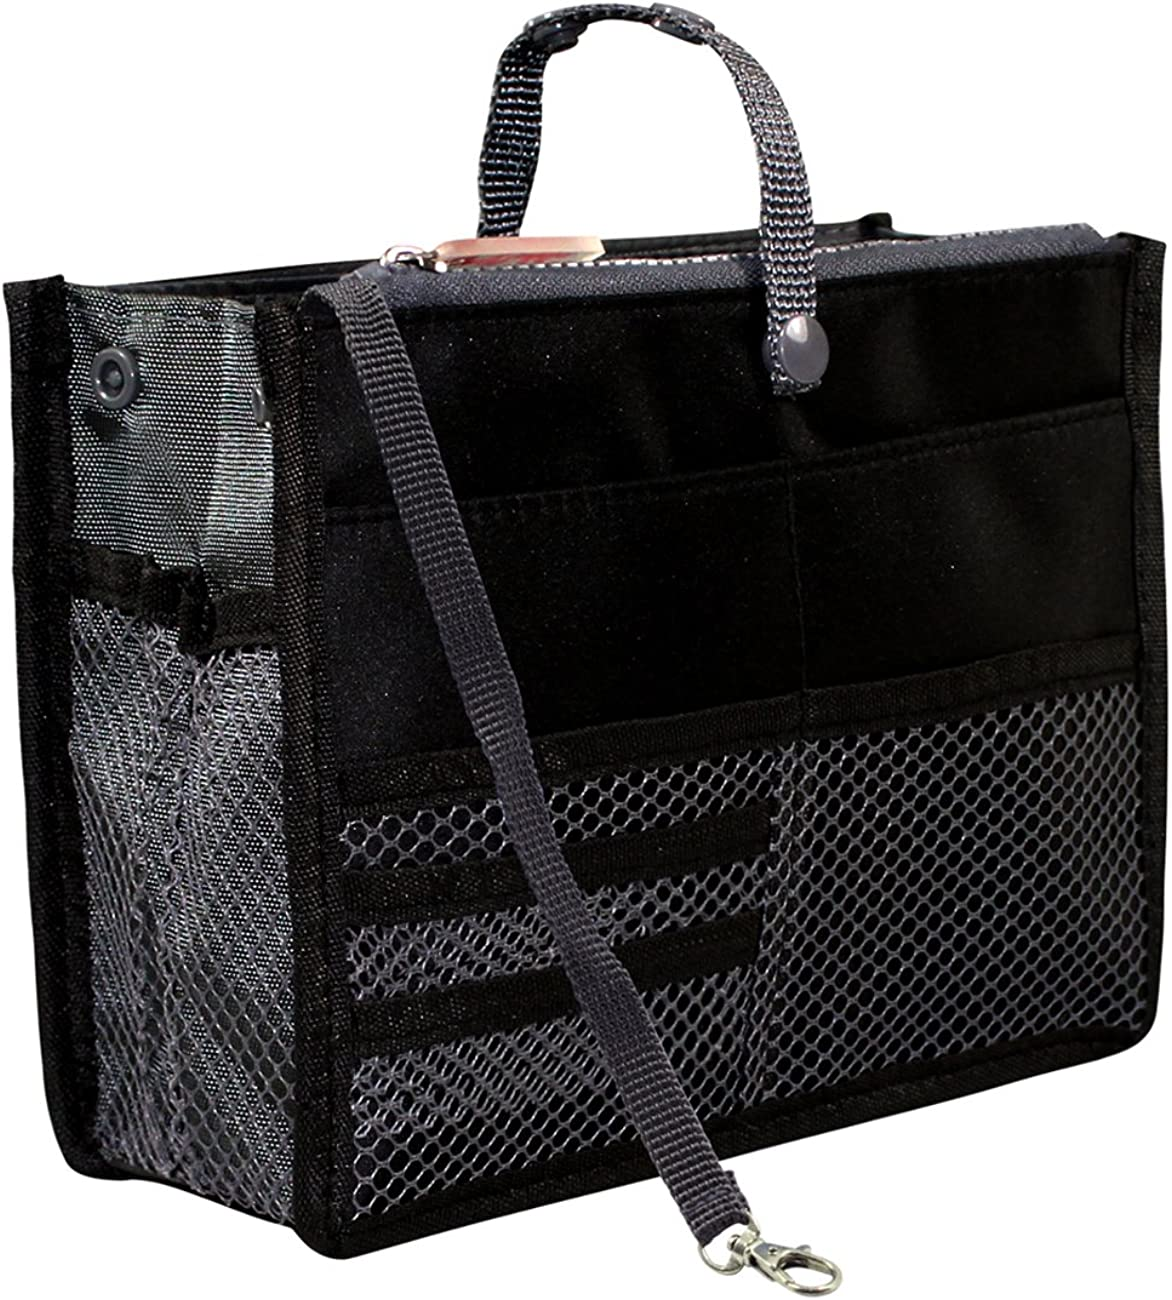 Nifty Patented Handbag Purse Organizer Insert - 18 Compartments